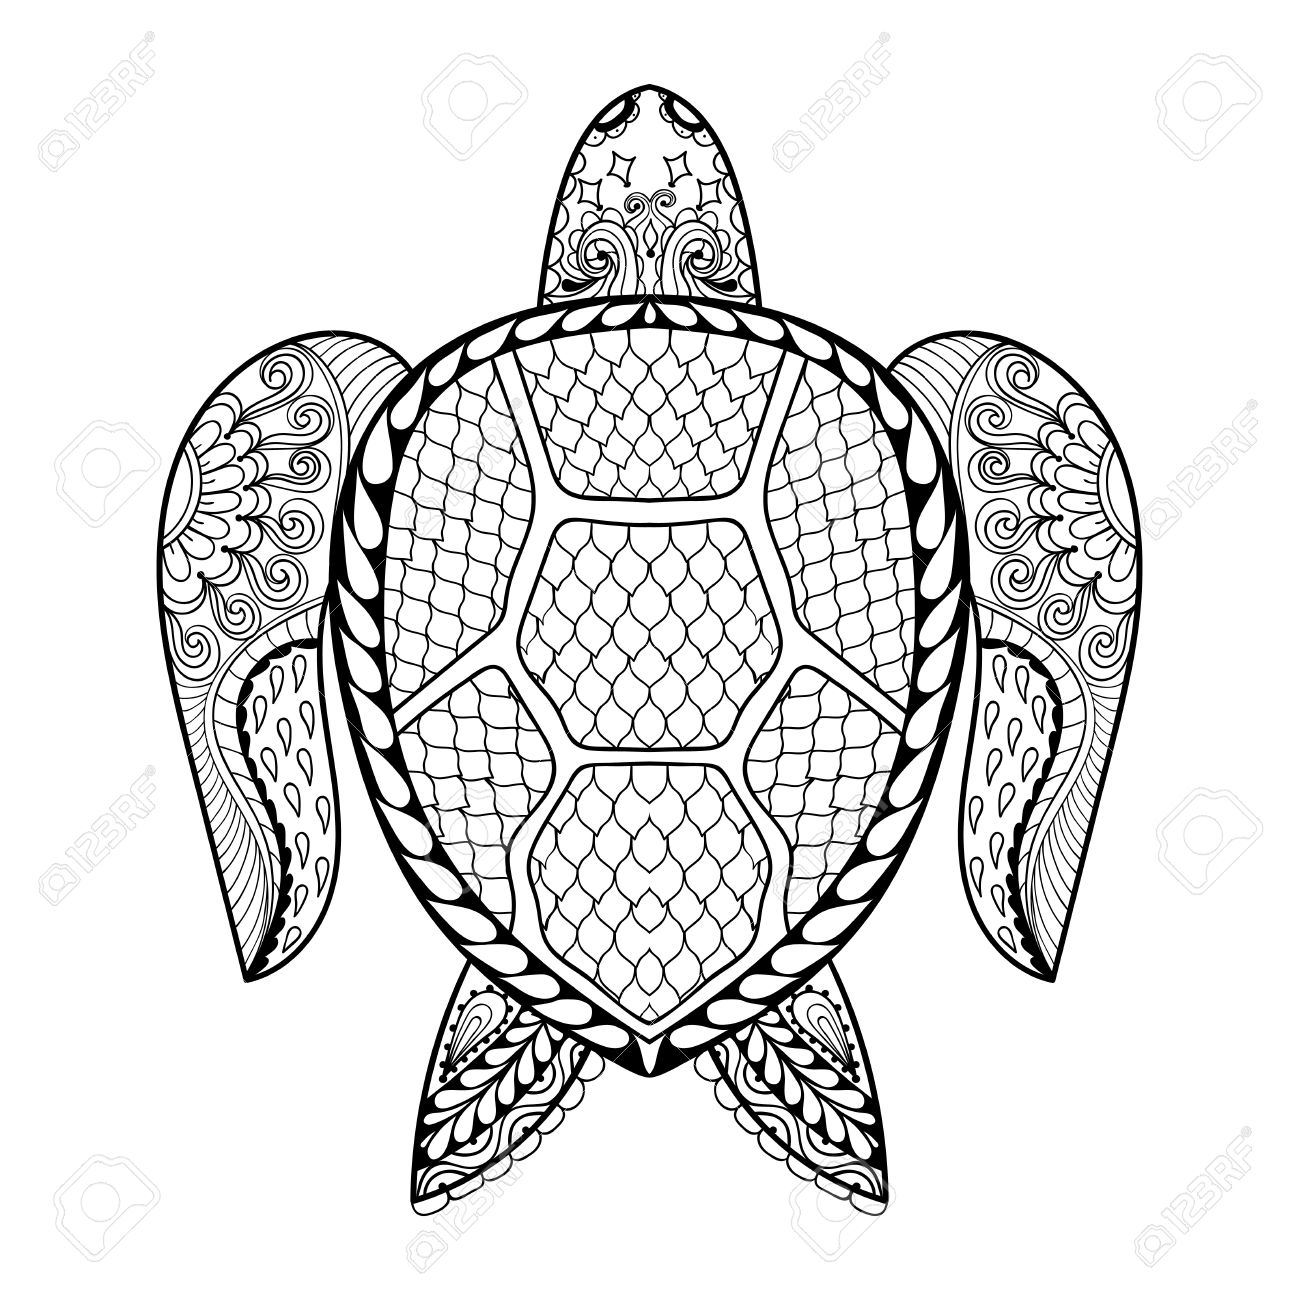 Turtle Line Drawing At Getdrawings